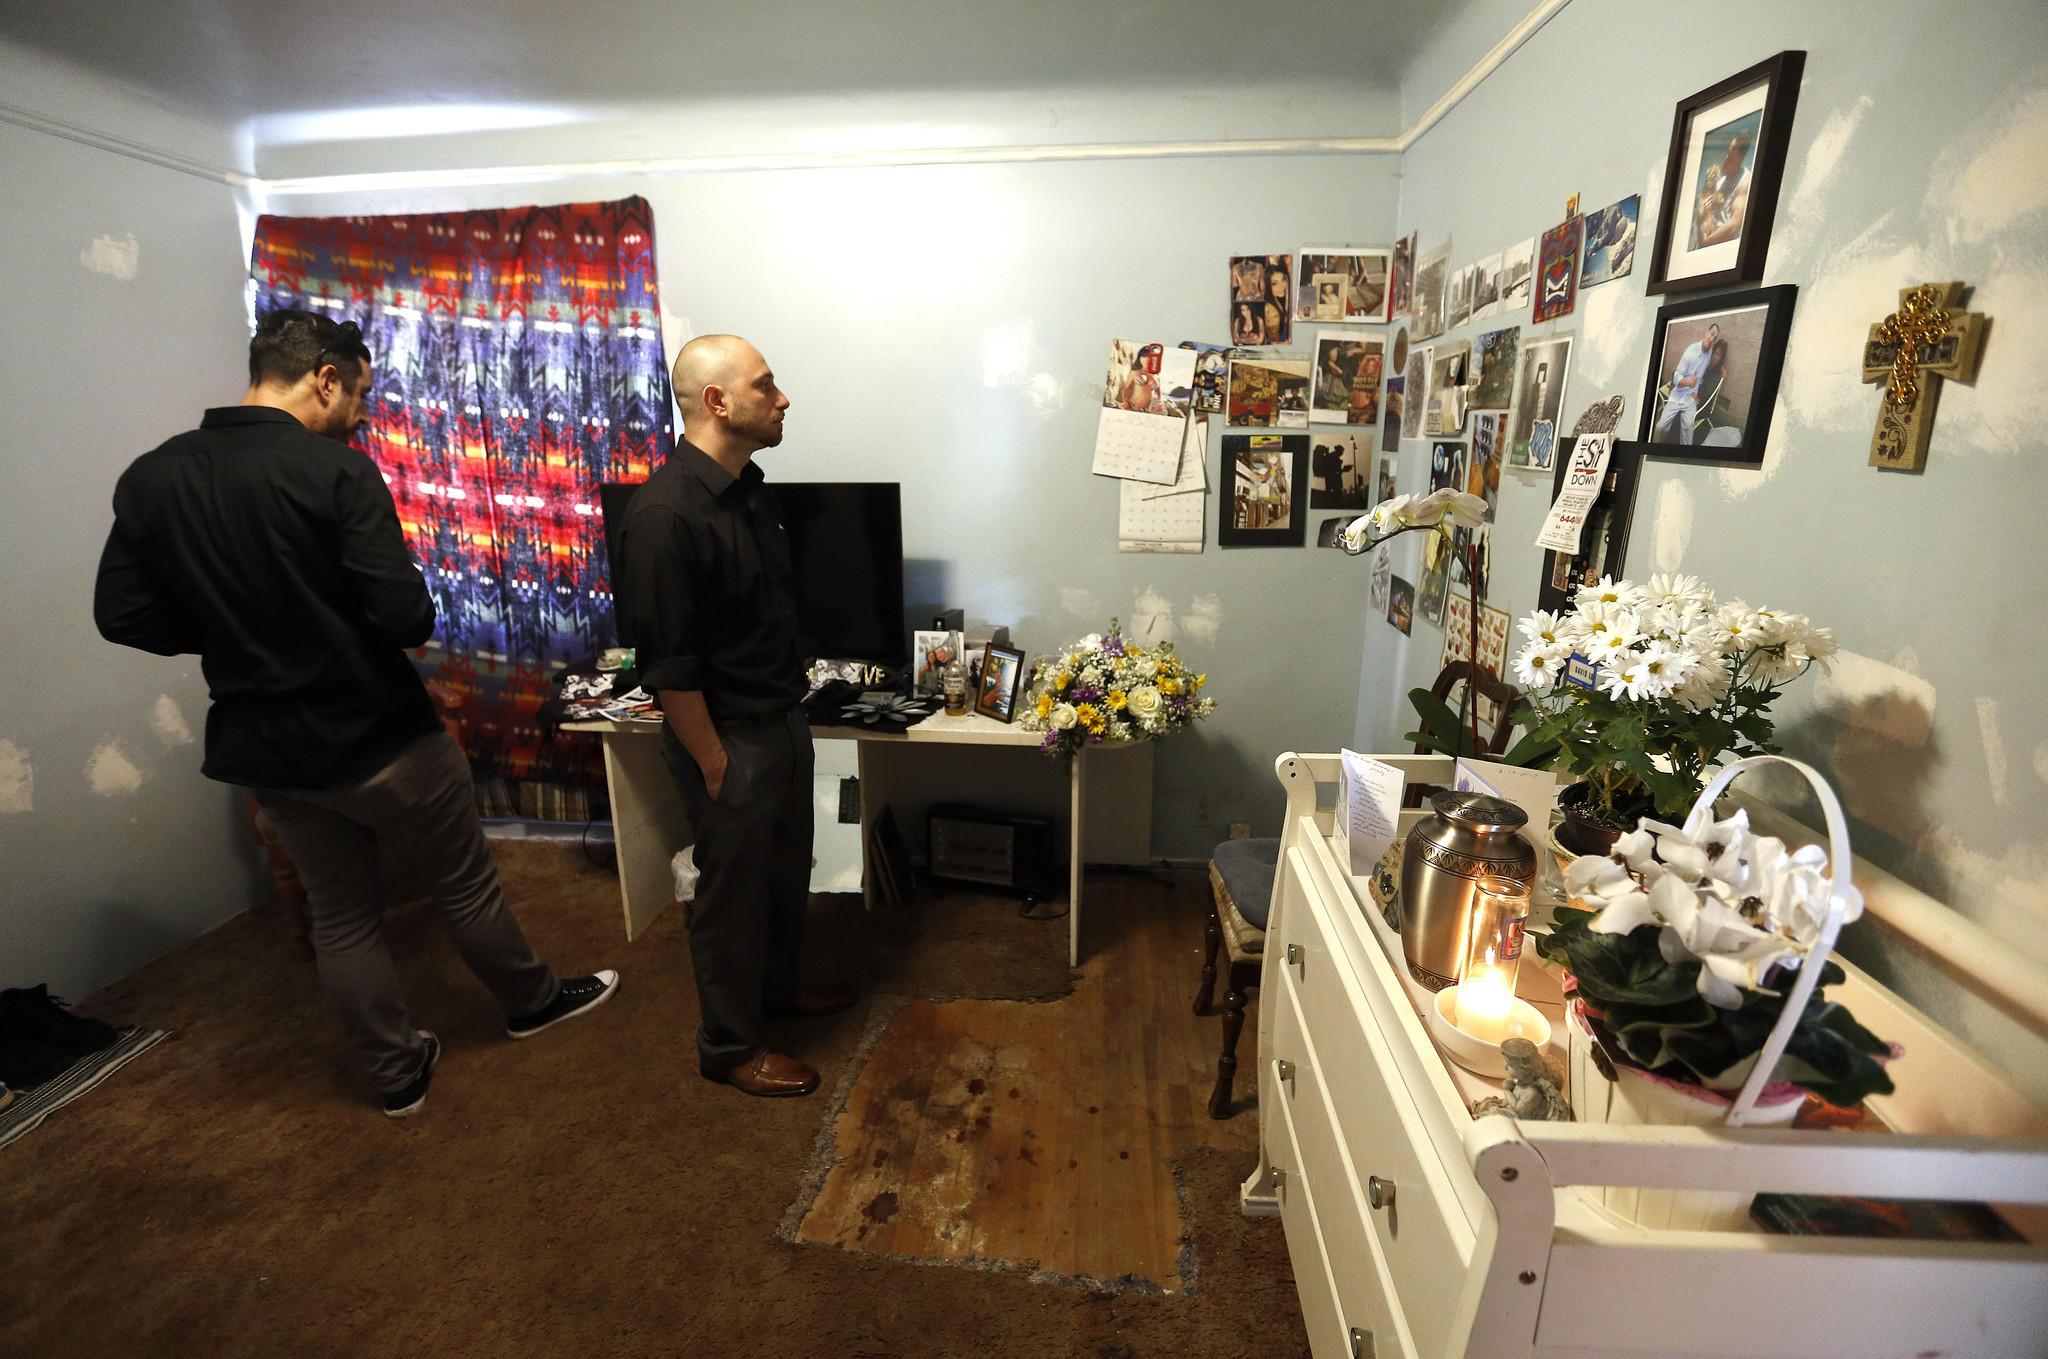 In Lopez's bedroom